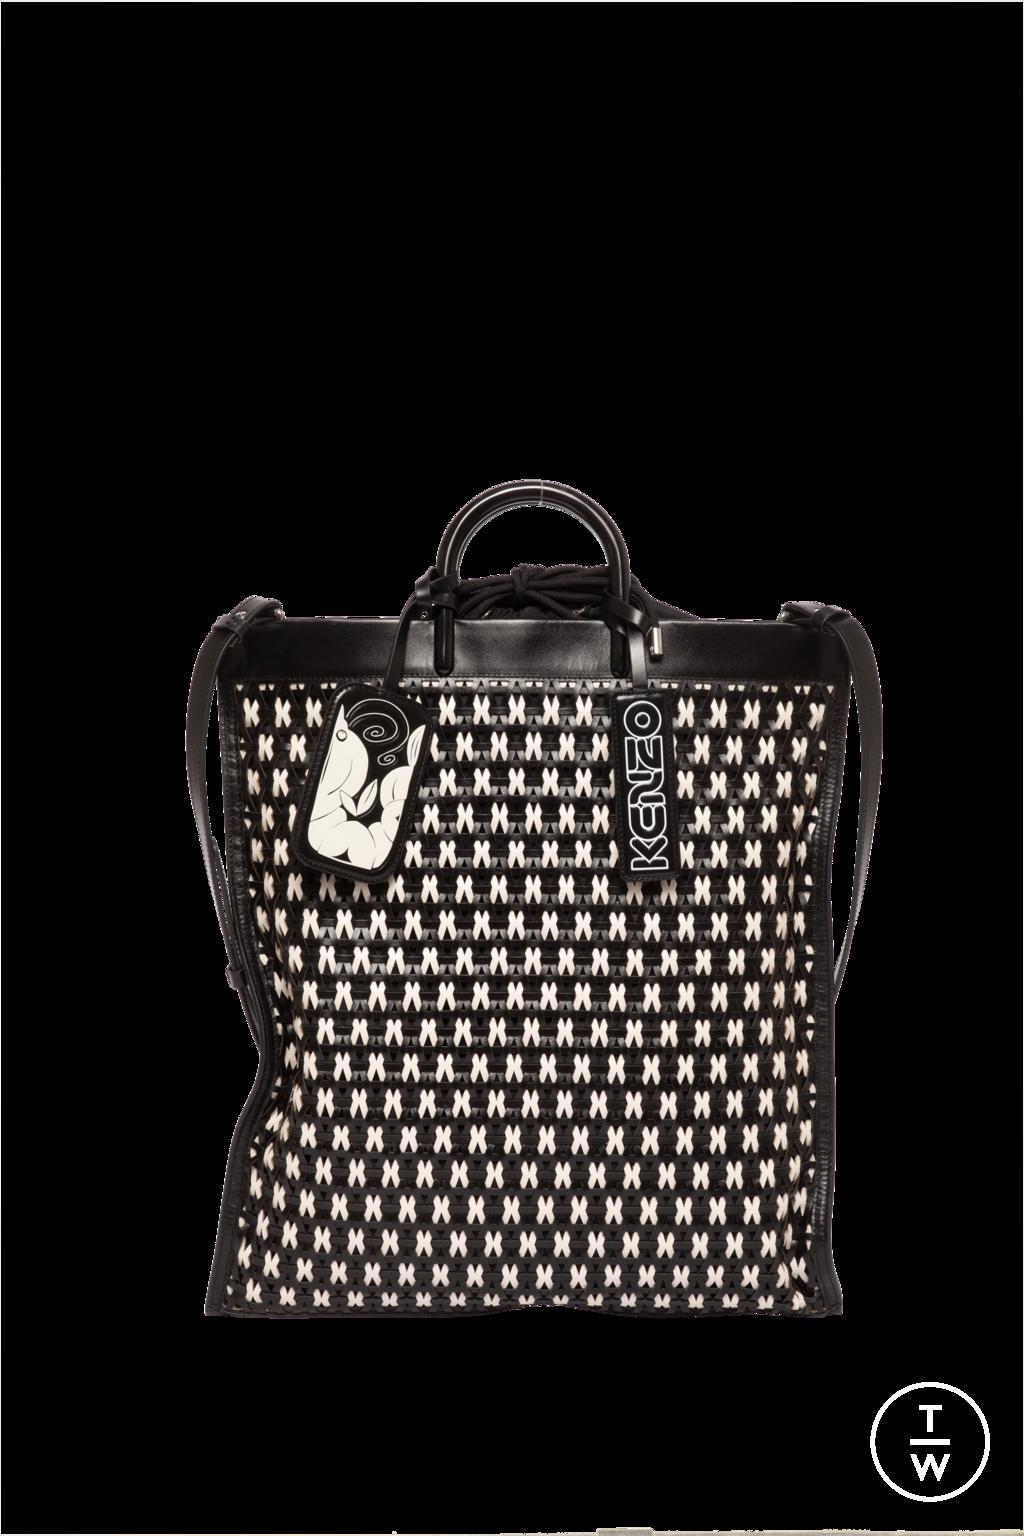 XL//XLarge L19 Stretchy One Shoulder Blouse,Snakeskin Print,Brown//Metallic